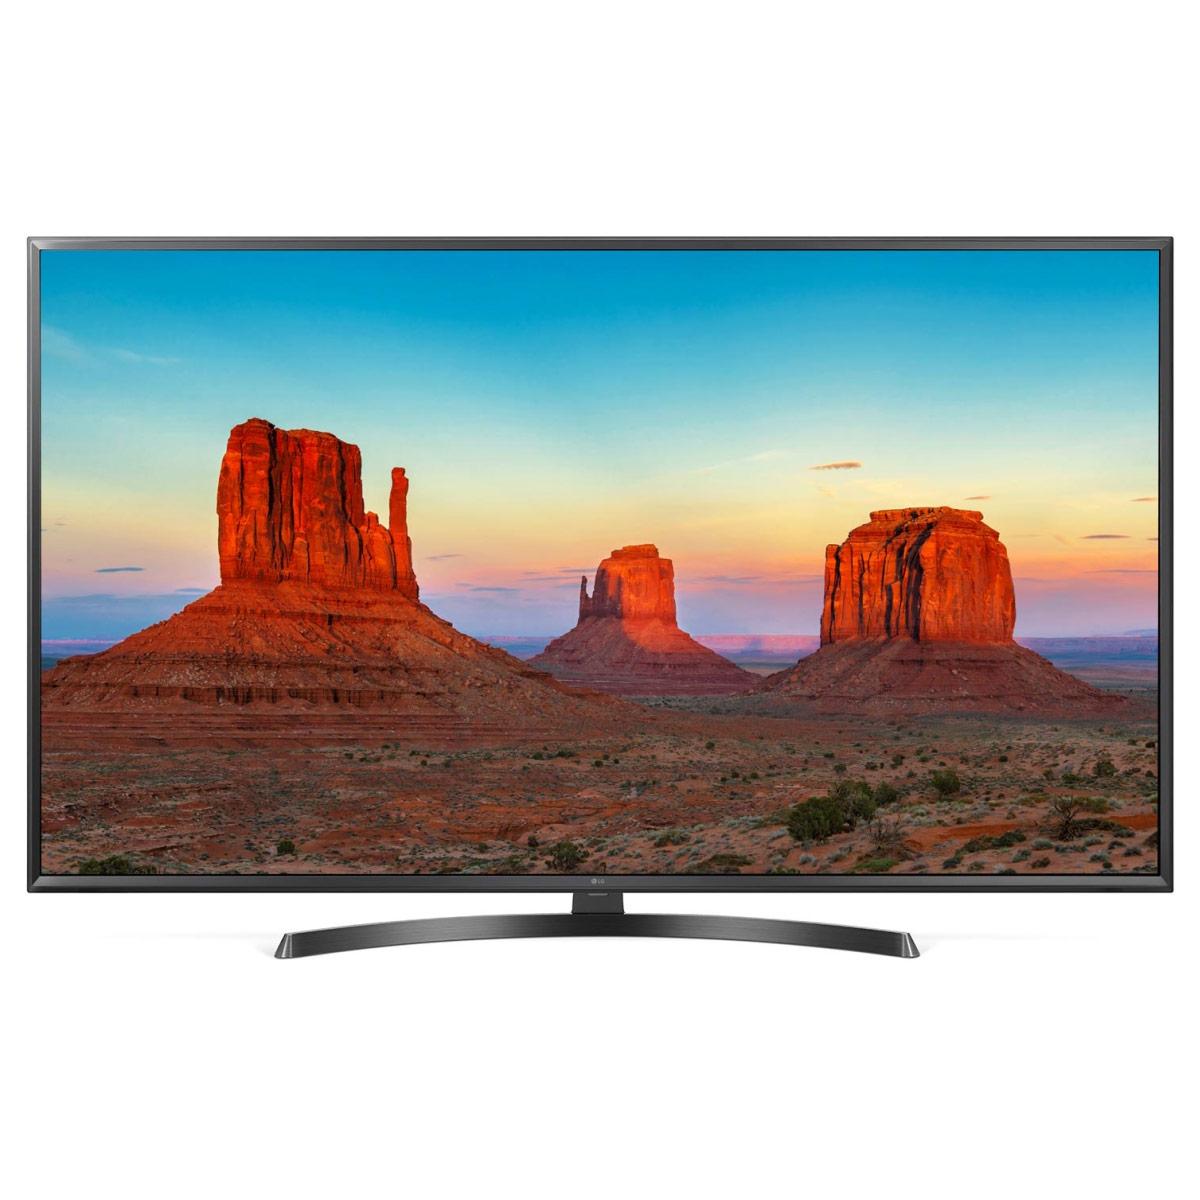 "TV LG 50UK6470 Téléviseur LED 4K 50"" (127 cm) 16/9 - 3840 x 2160 pixels - Ultra HD 2160p - HDR - Wi-Fi - Bluetooth - 1600 Hz"